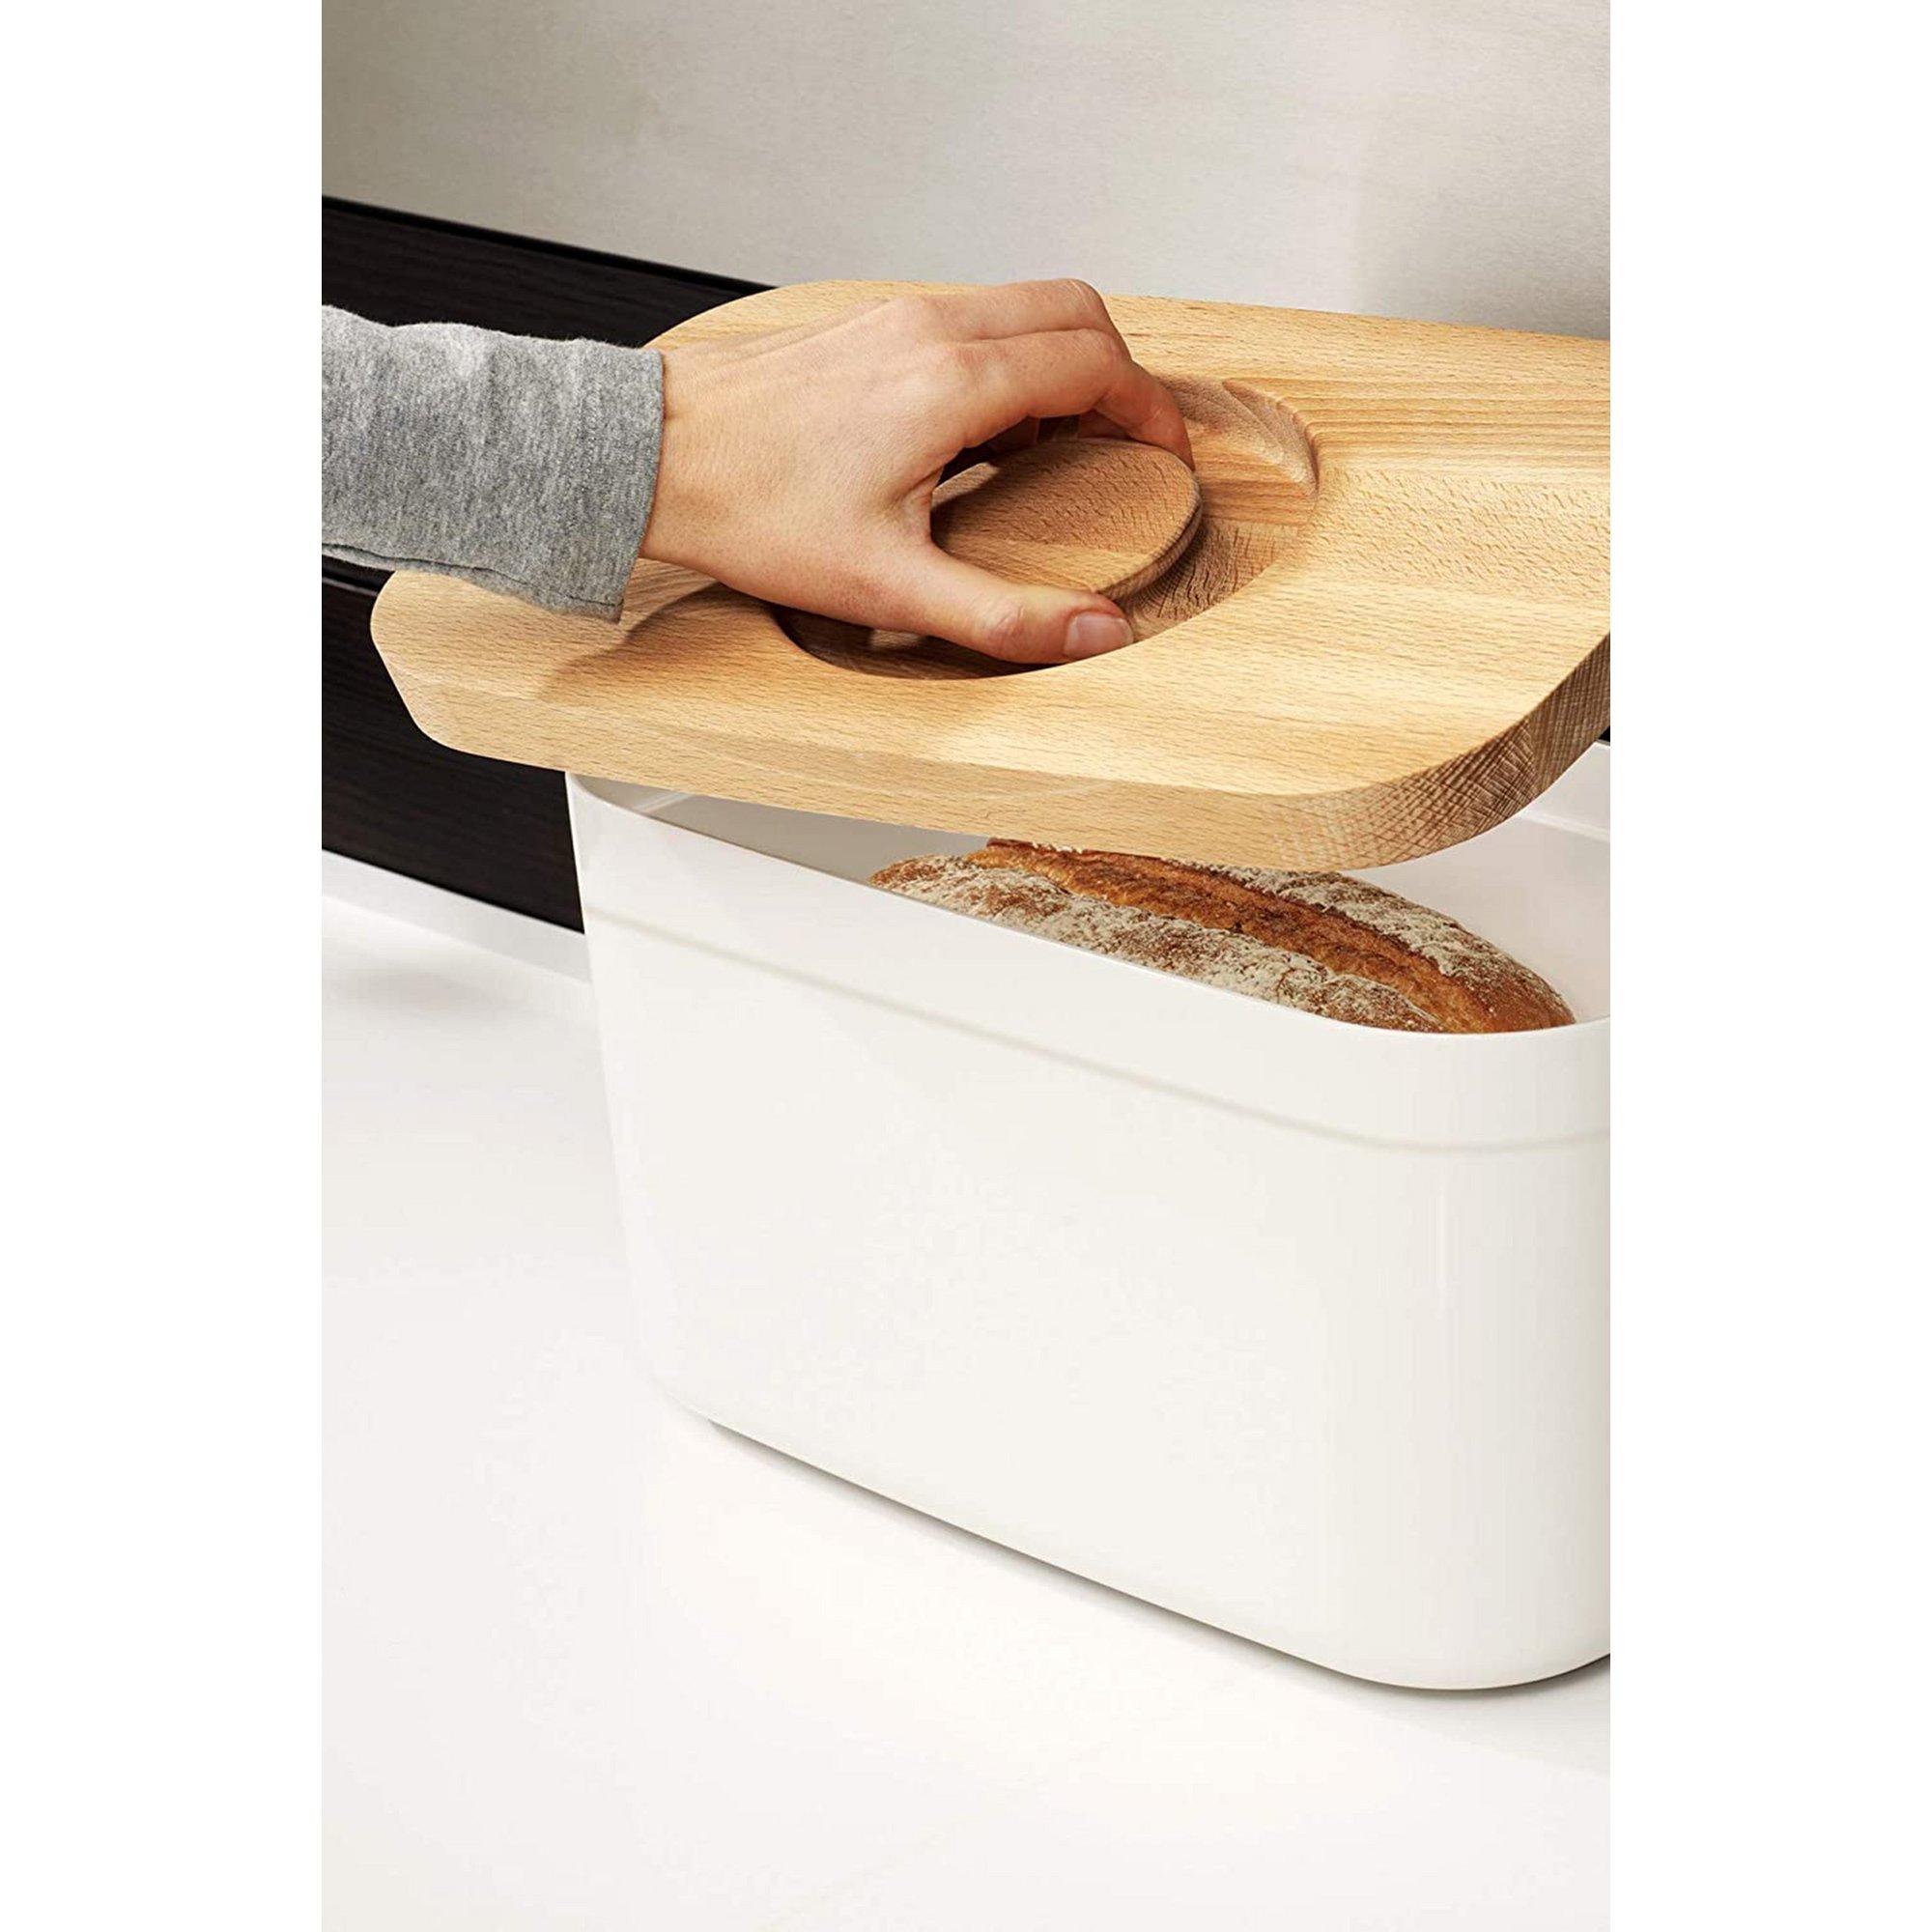 Image of Joseph Joseph Bread Bin with Cutting Board